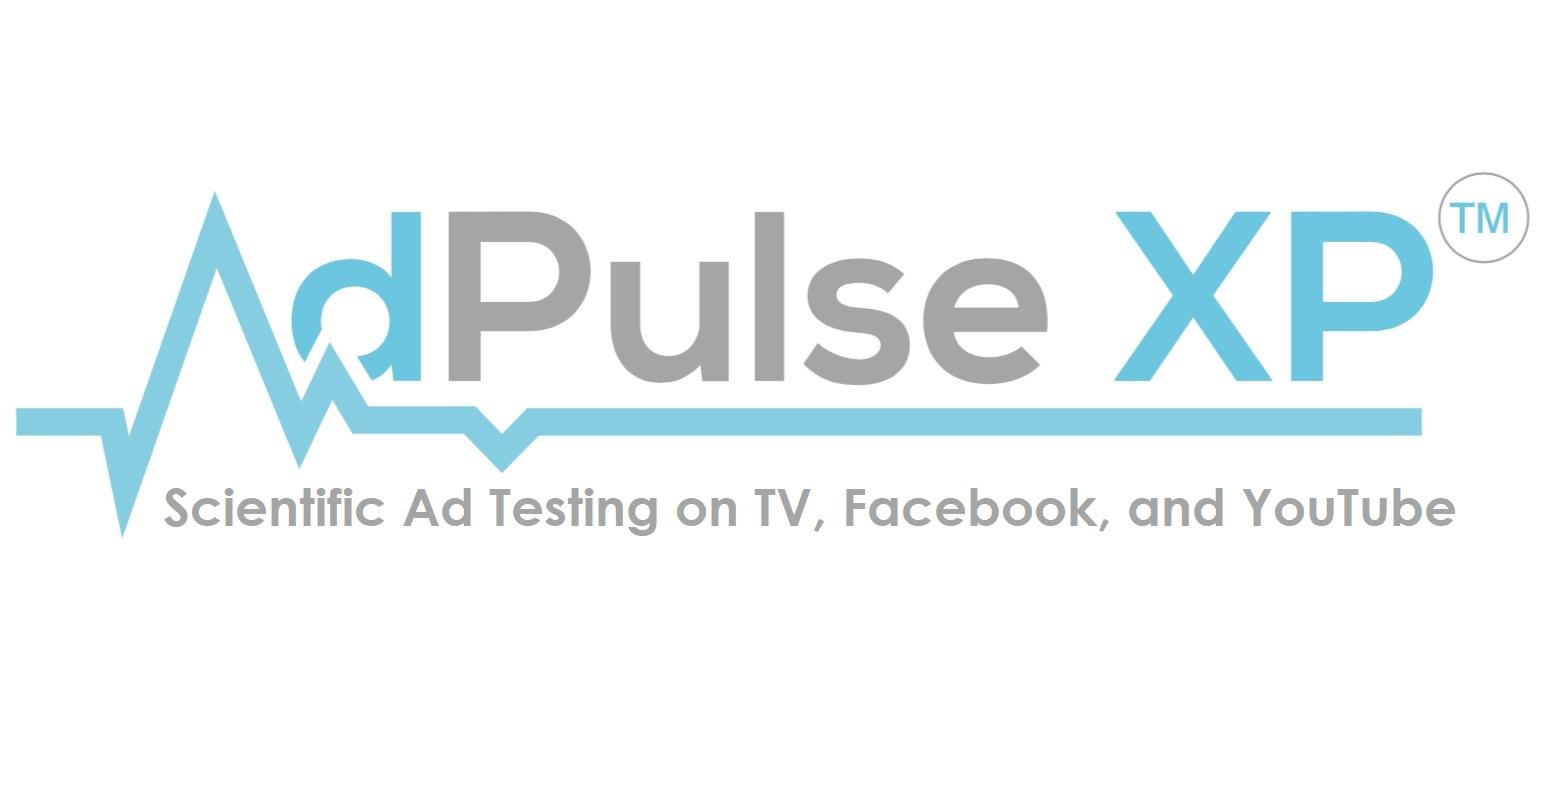 AdPulse promo.jpg